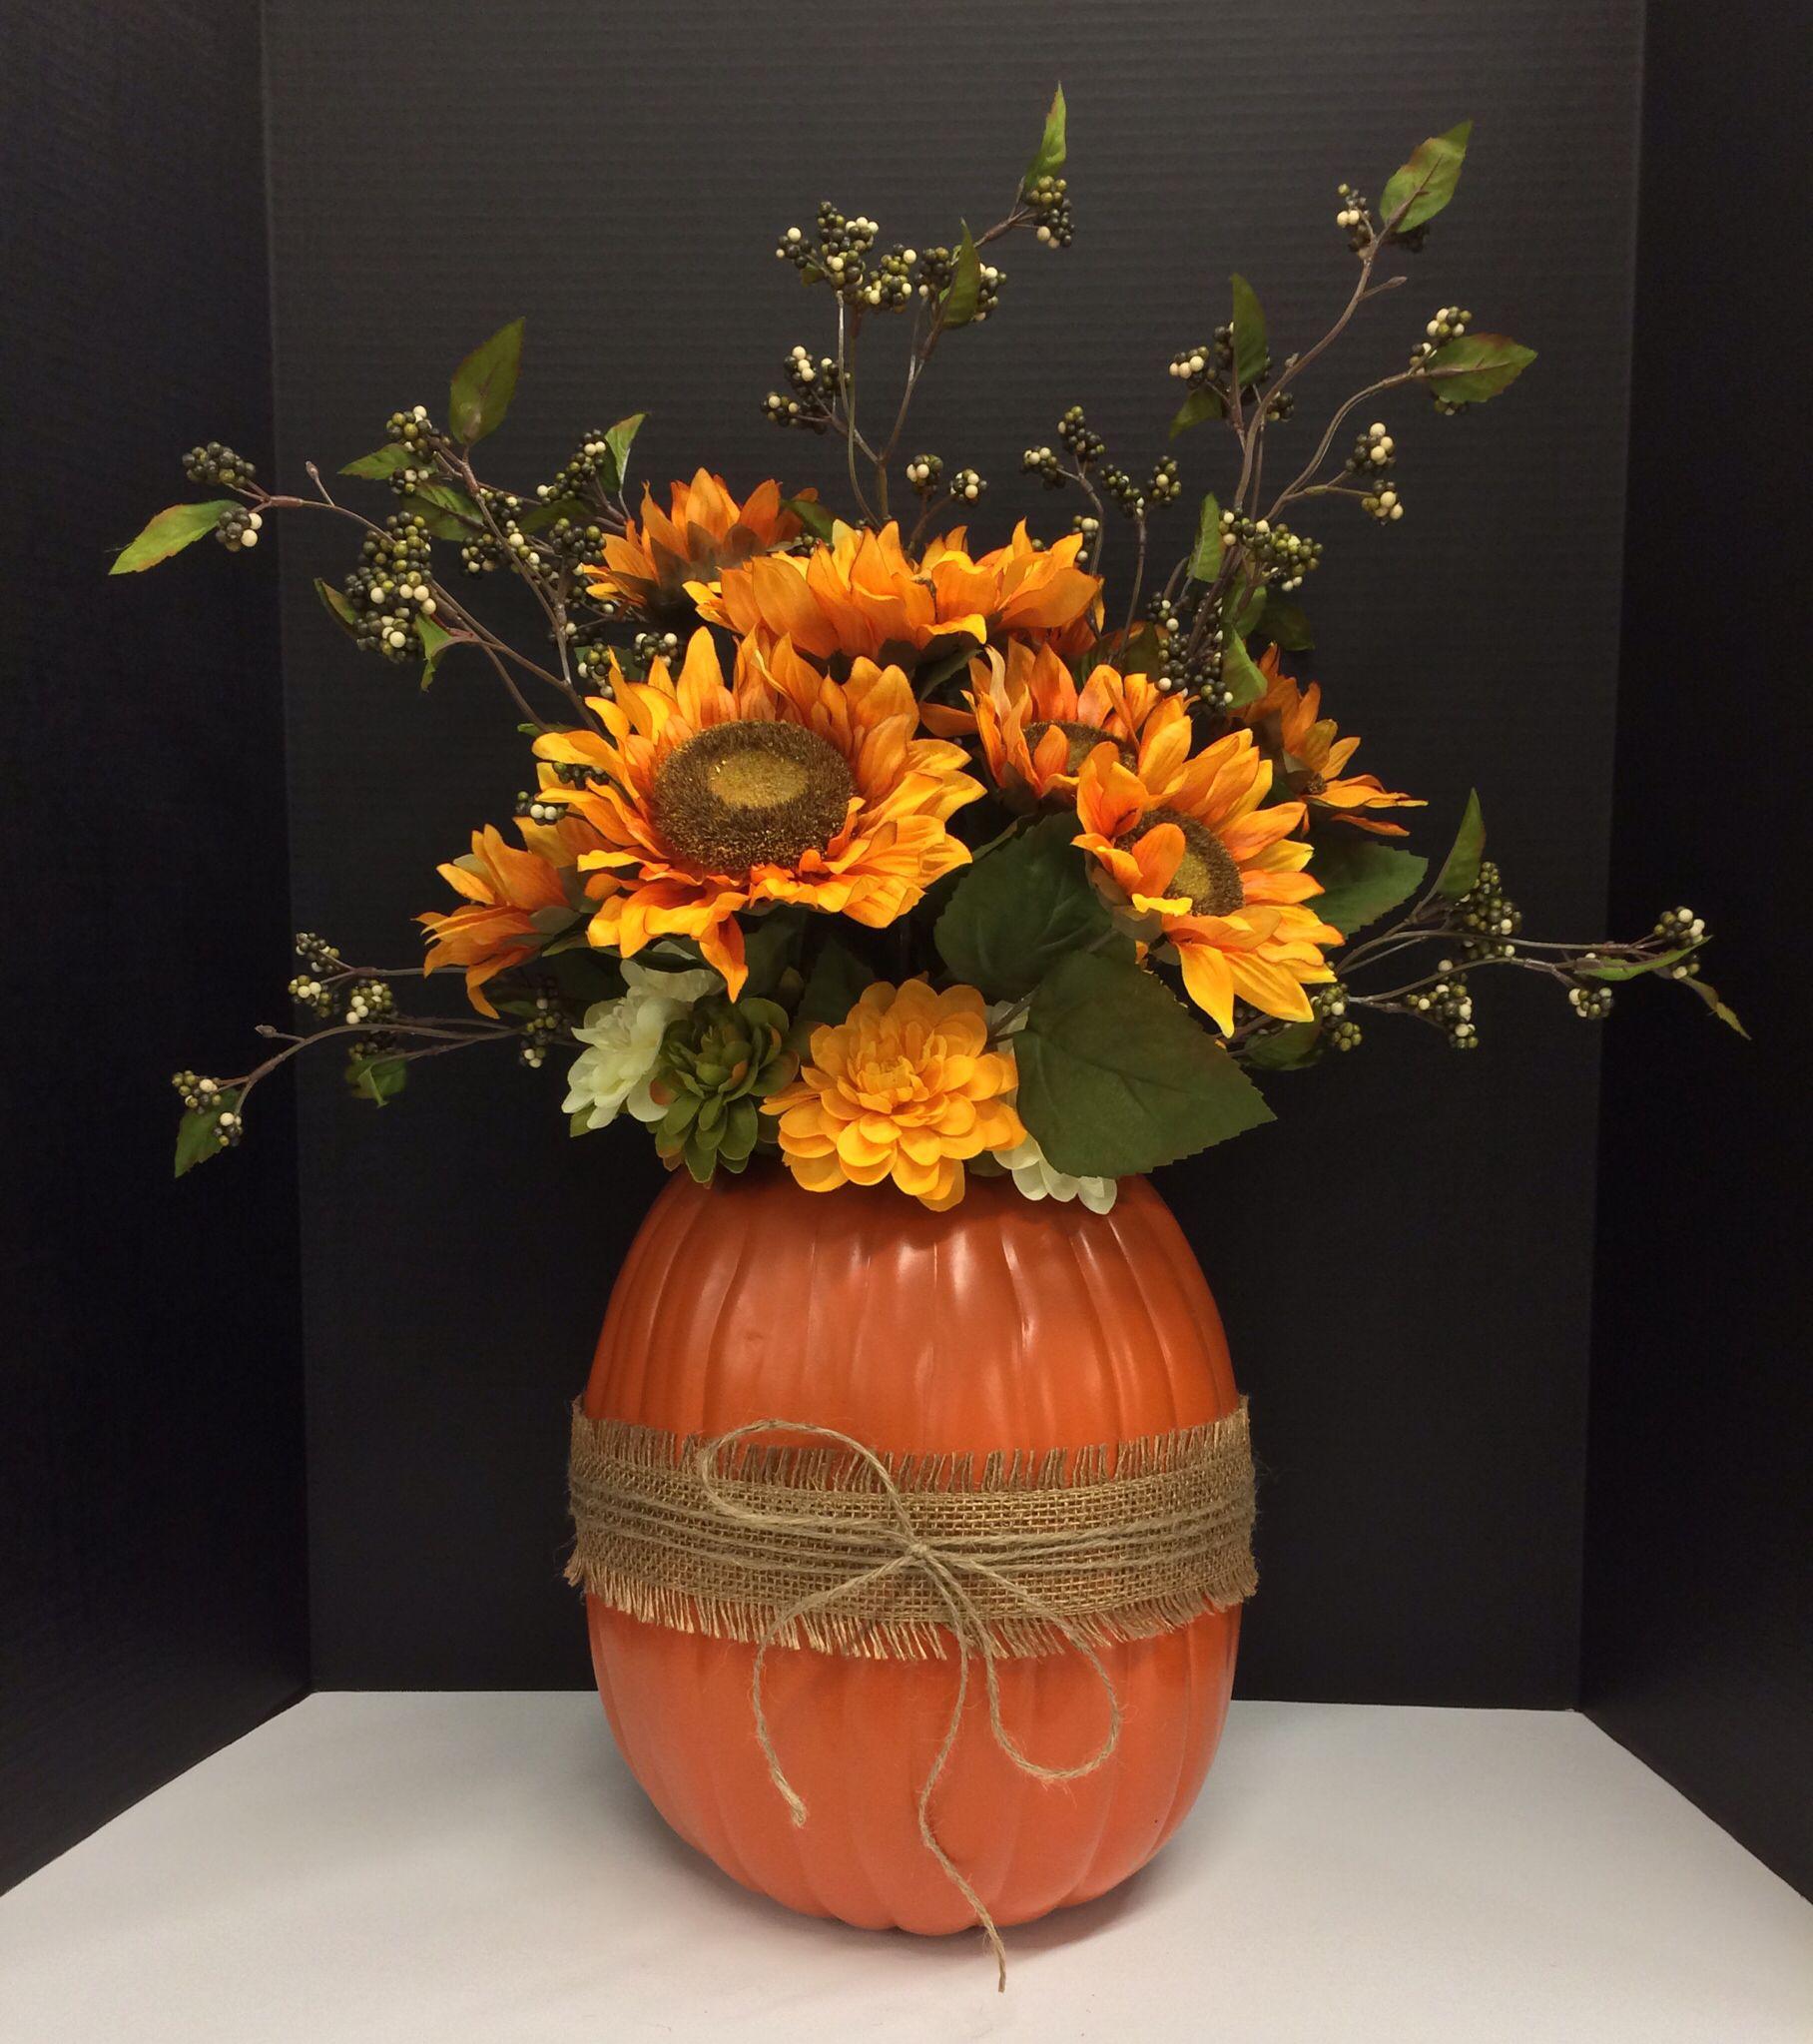 Early Fall 2014 Season Faux Pumpkin Floral Design and